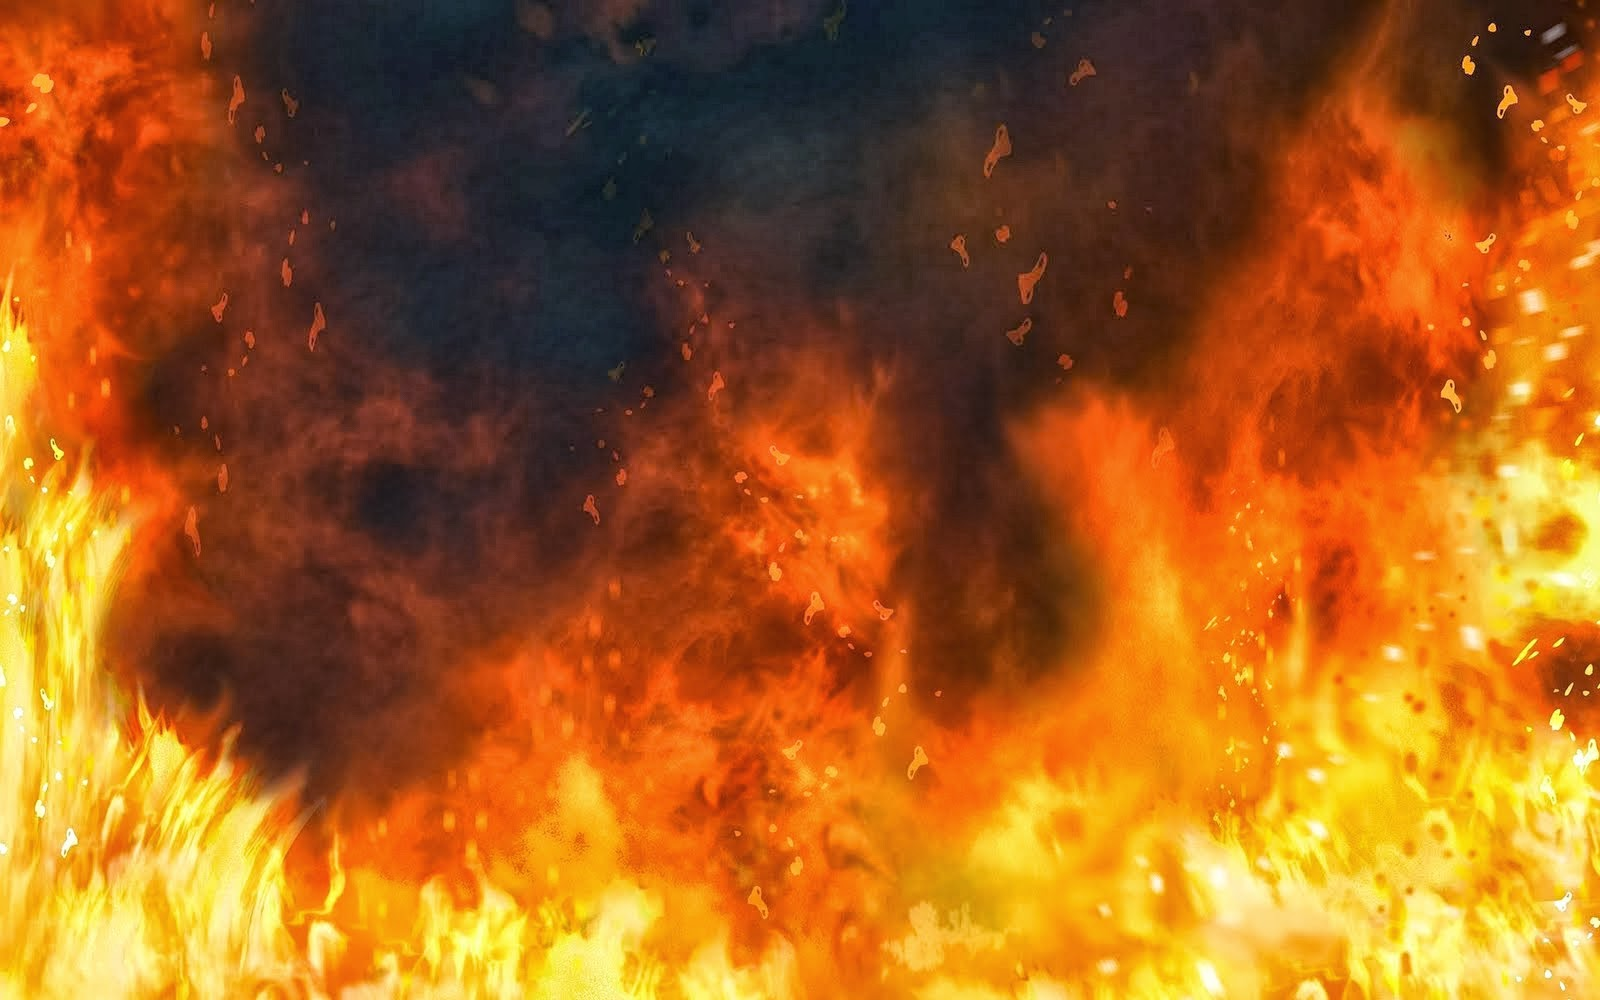 dark black fire wallpapers hd fire wallpaper picture image 5jpg 1600x1000